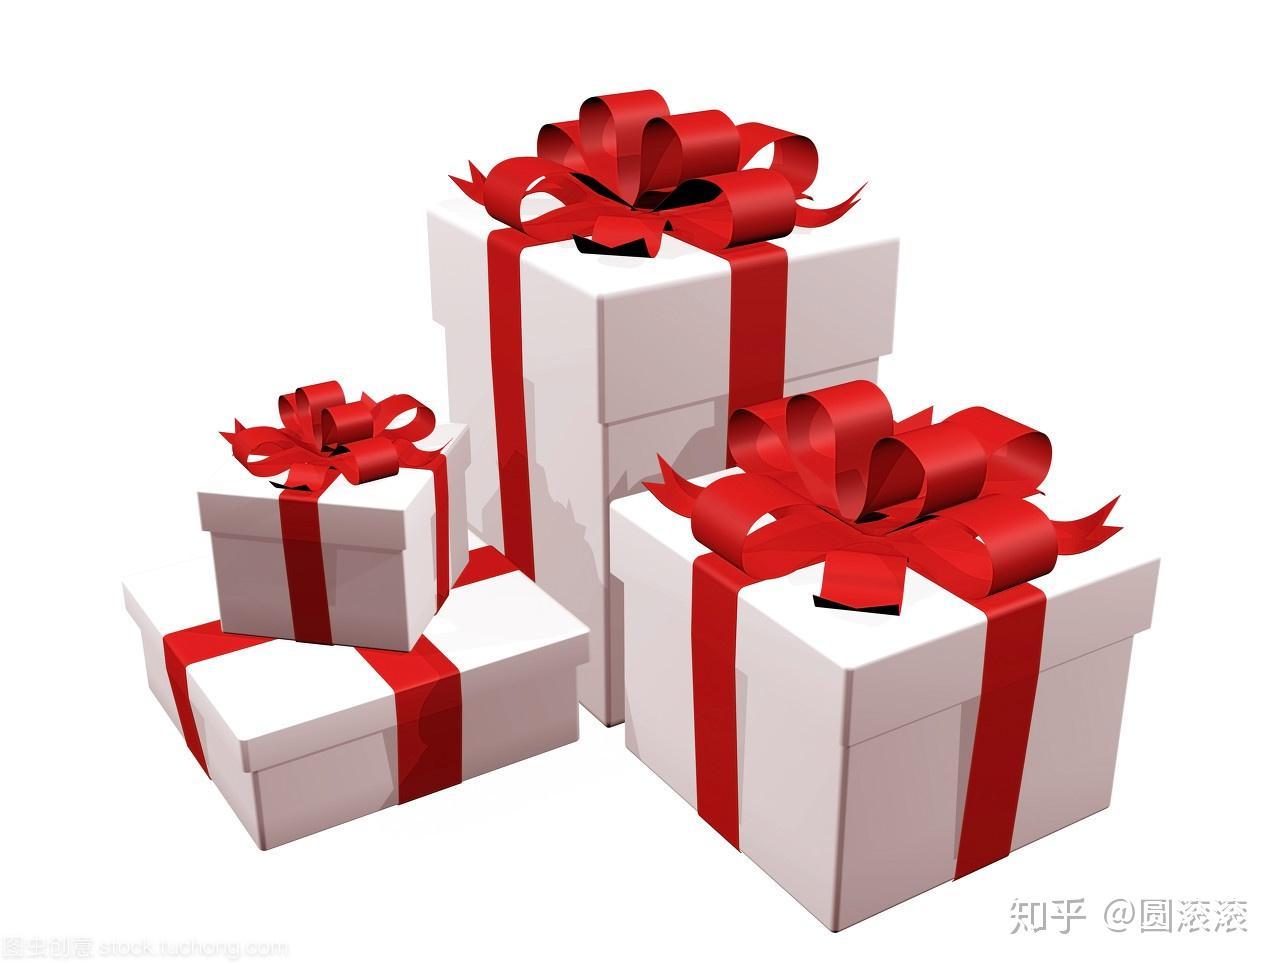 diy相册文字闺蜜_闺蜜过生日应该送什么礼物比较好 - 知乎